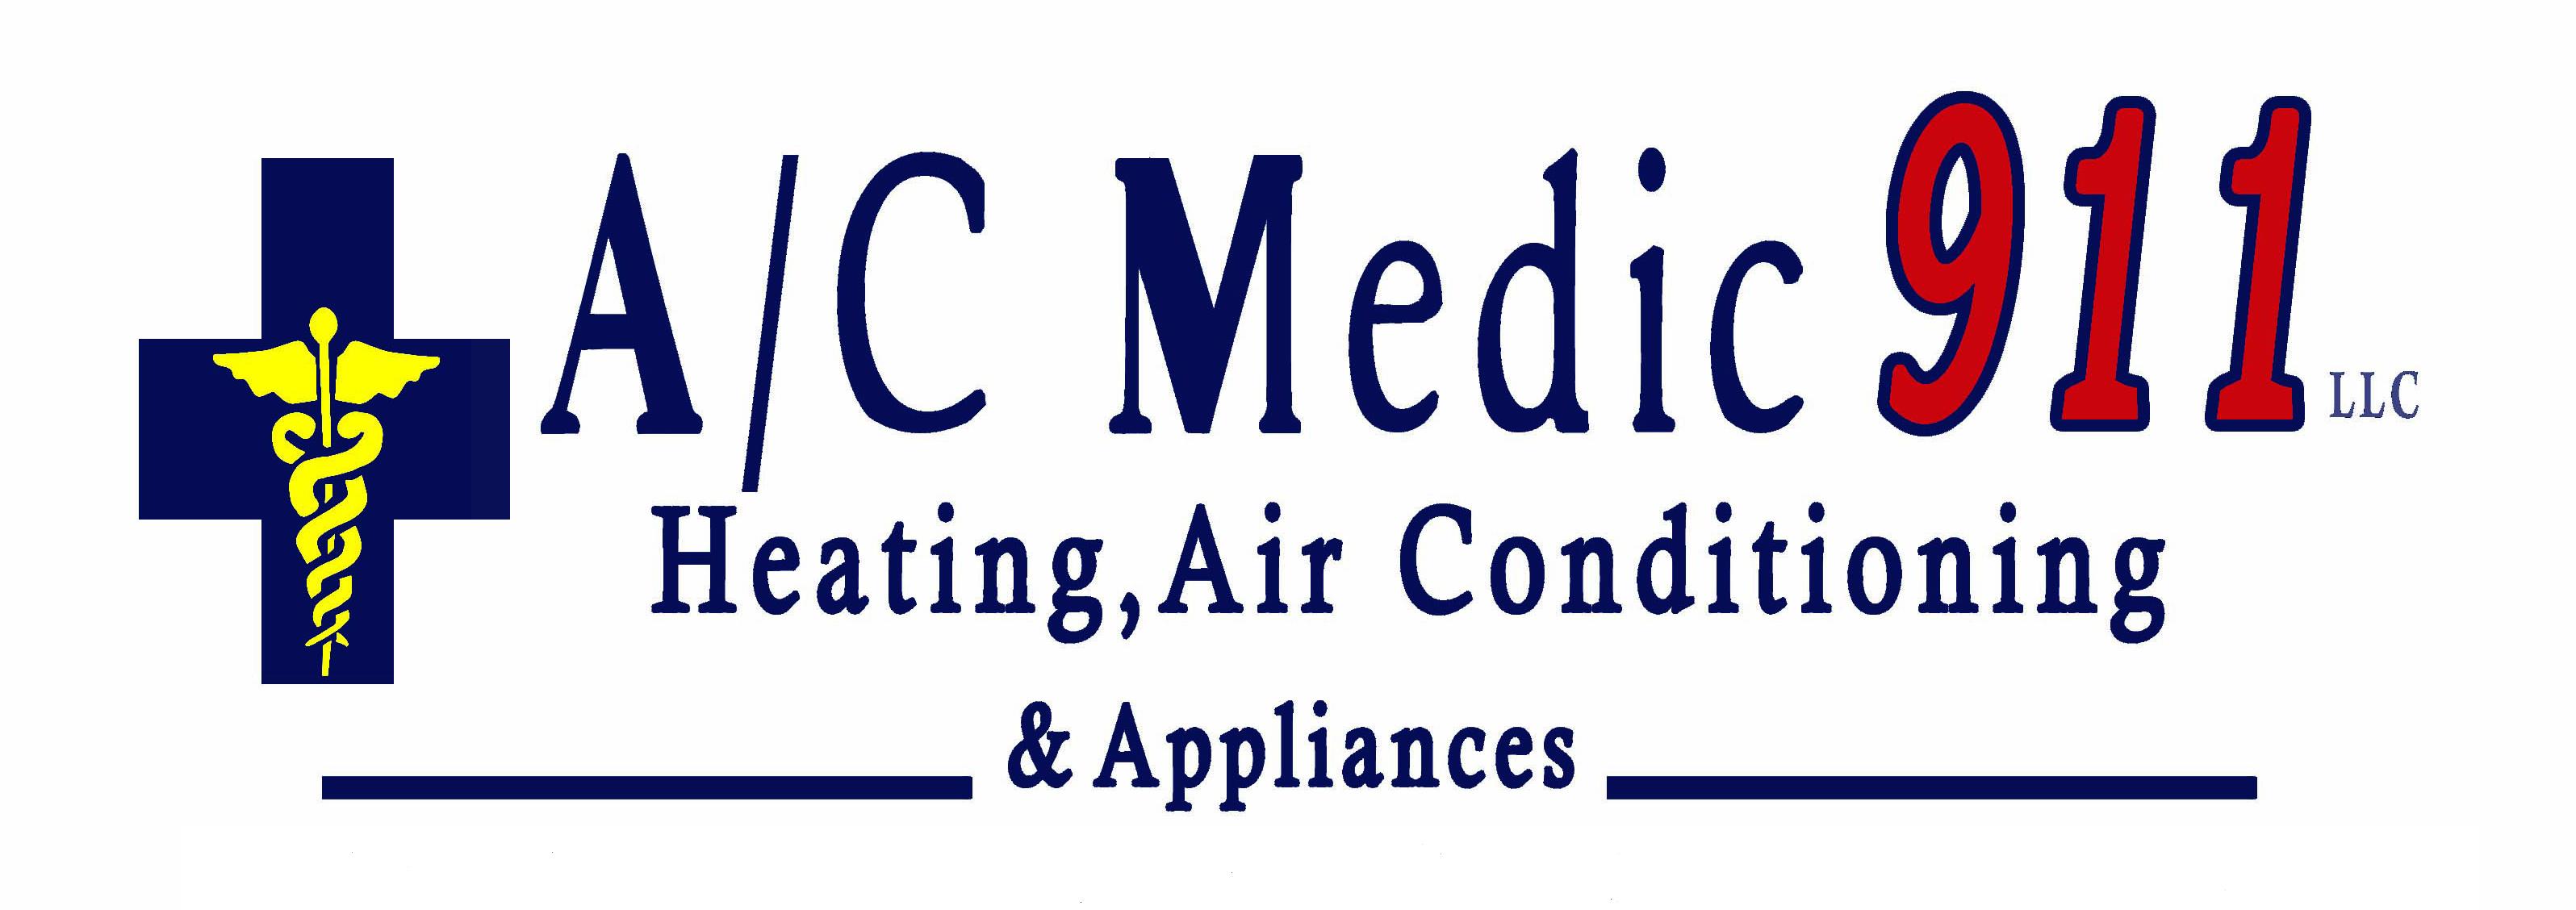 AC MEDIC color_CC